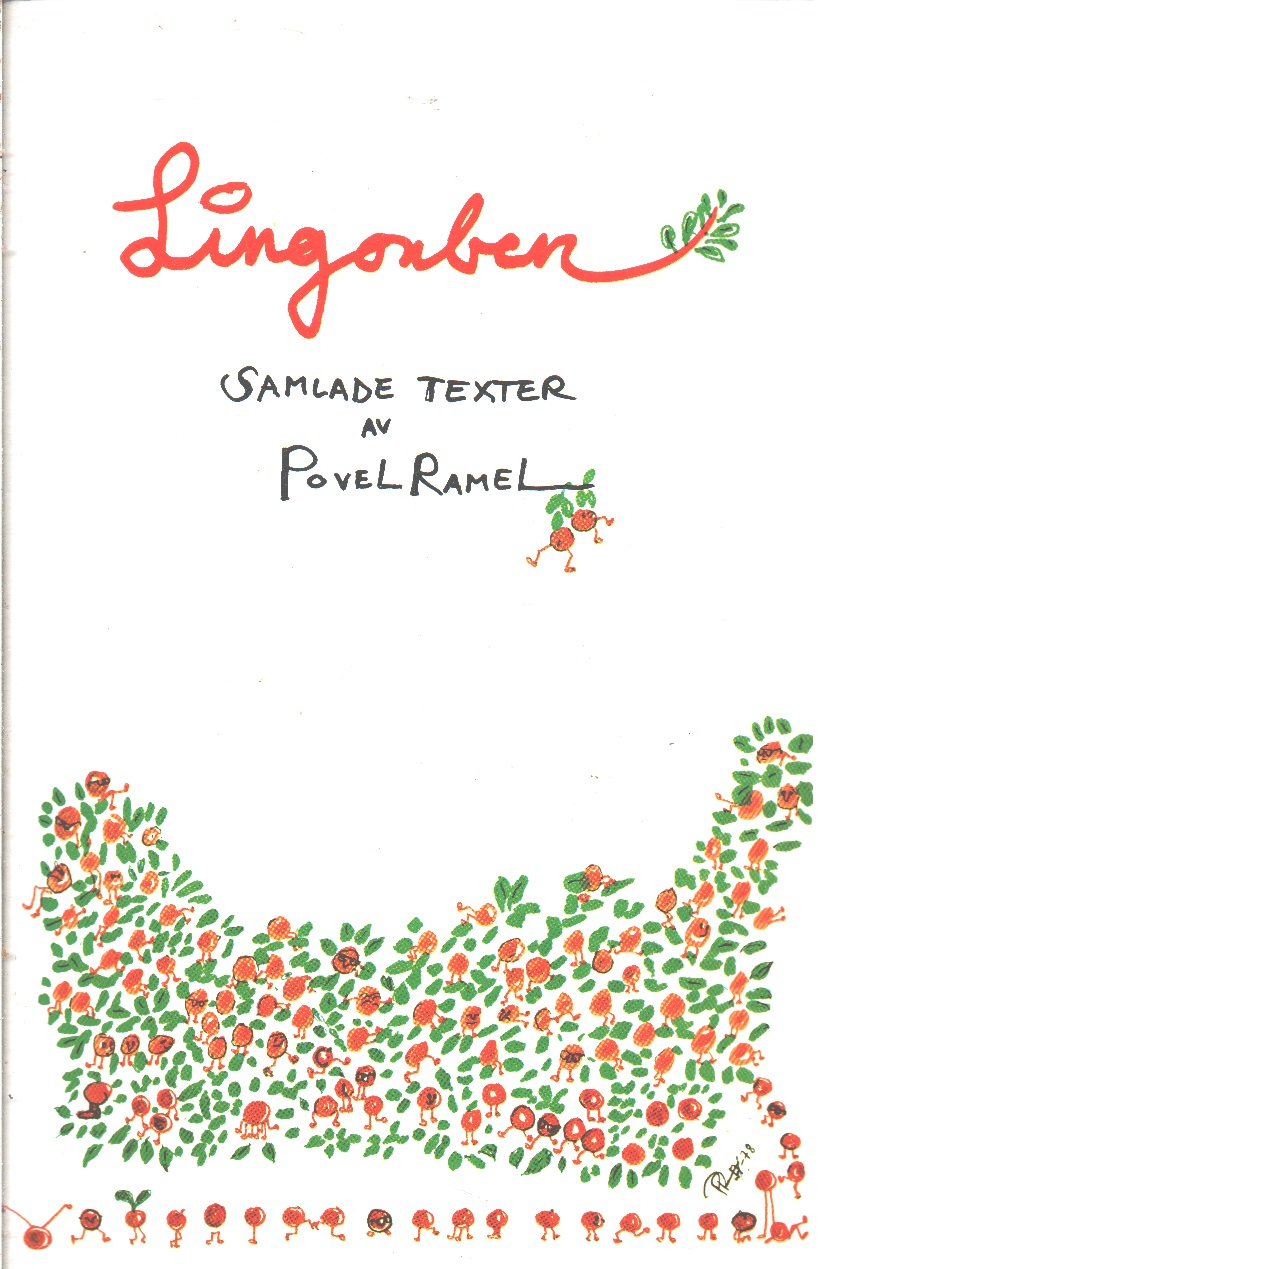 Lingonben : åtta lådor poesi : [samlade texter] - Ramel, Povel